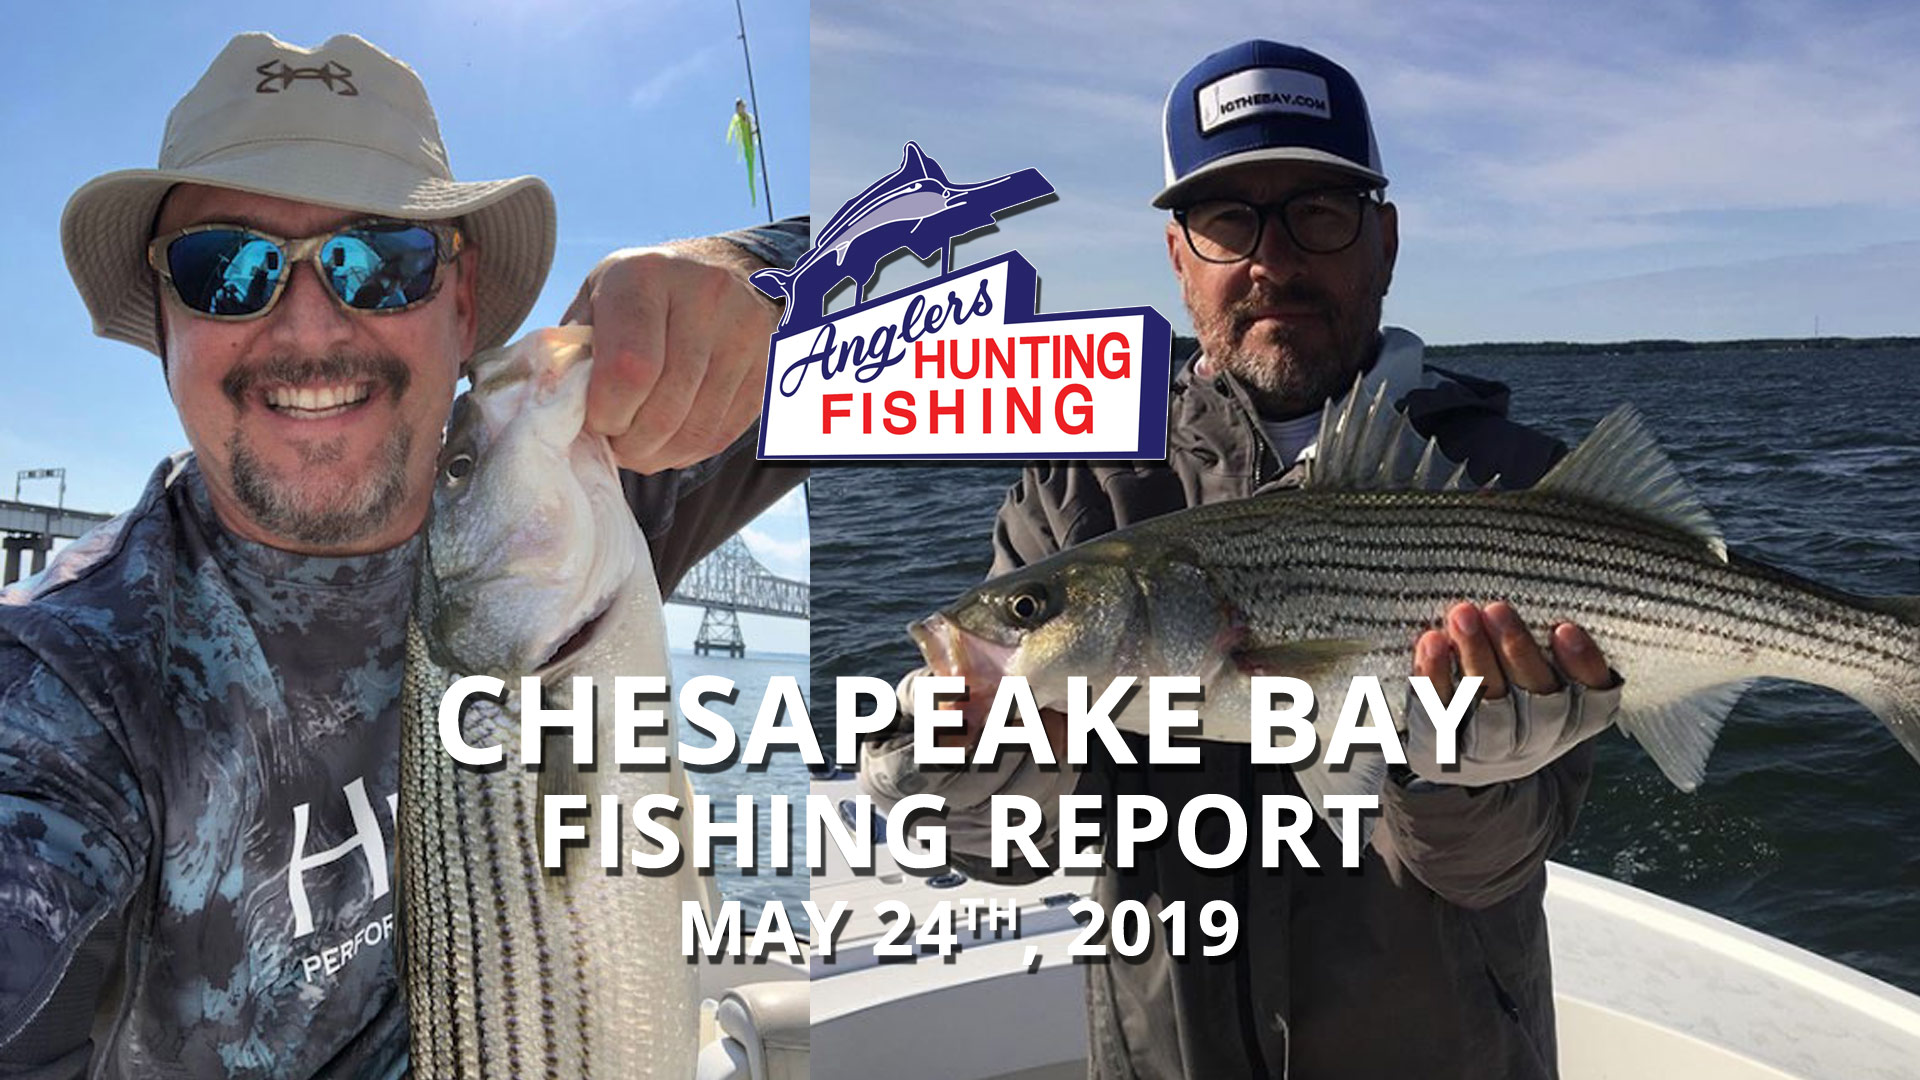 Chesapeake Bay Fishing Report - May 24th, 2019